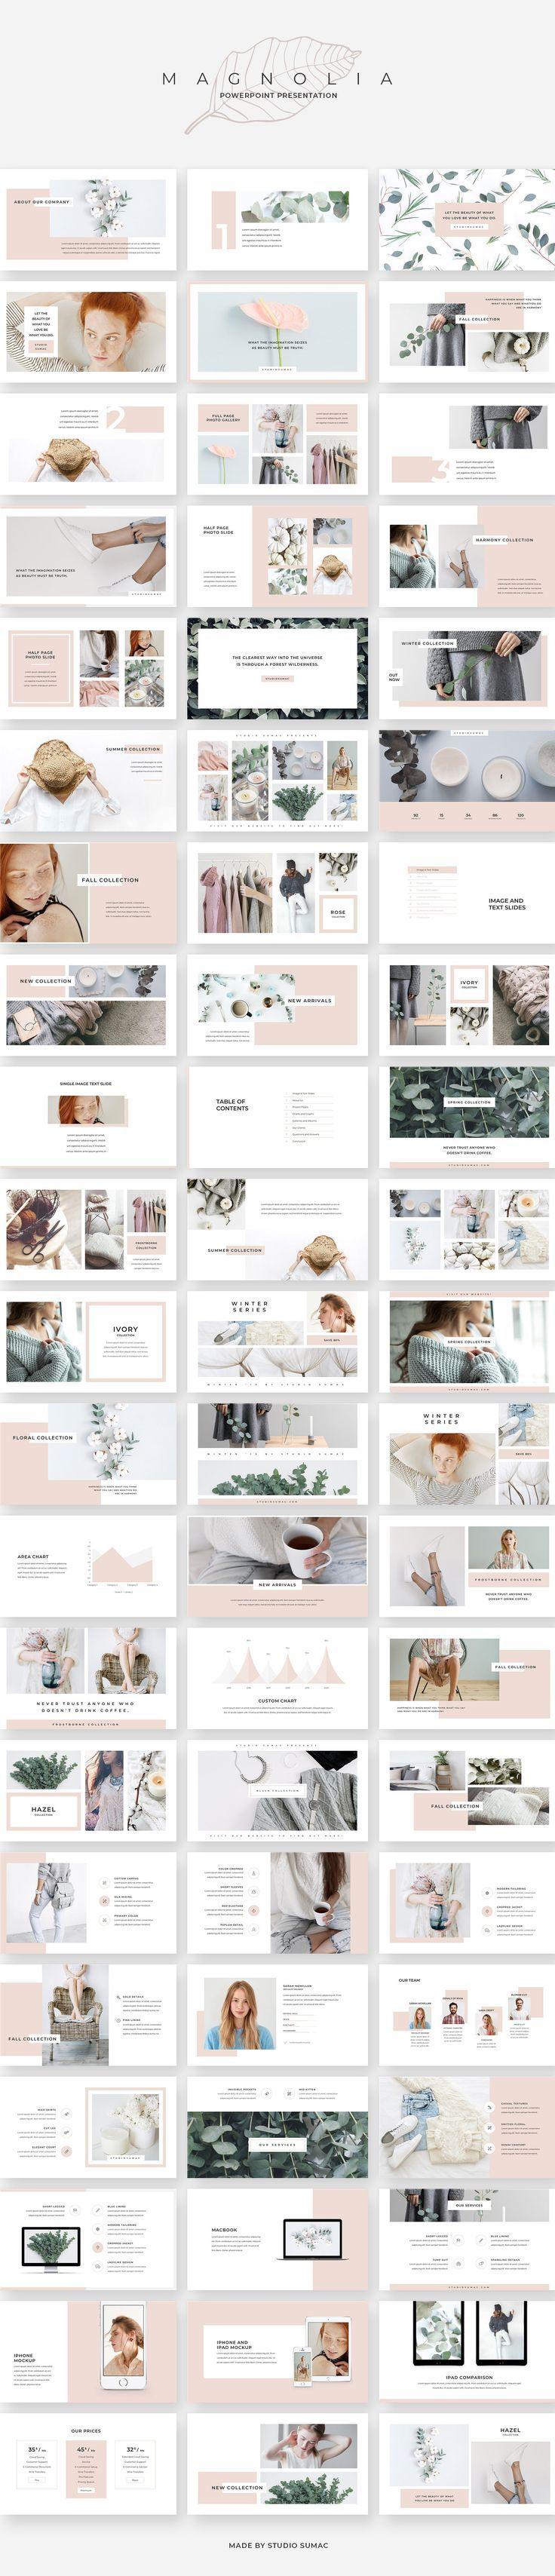 Magnolia PowerPoint Präsentation von Studio Sumac…